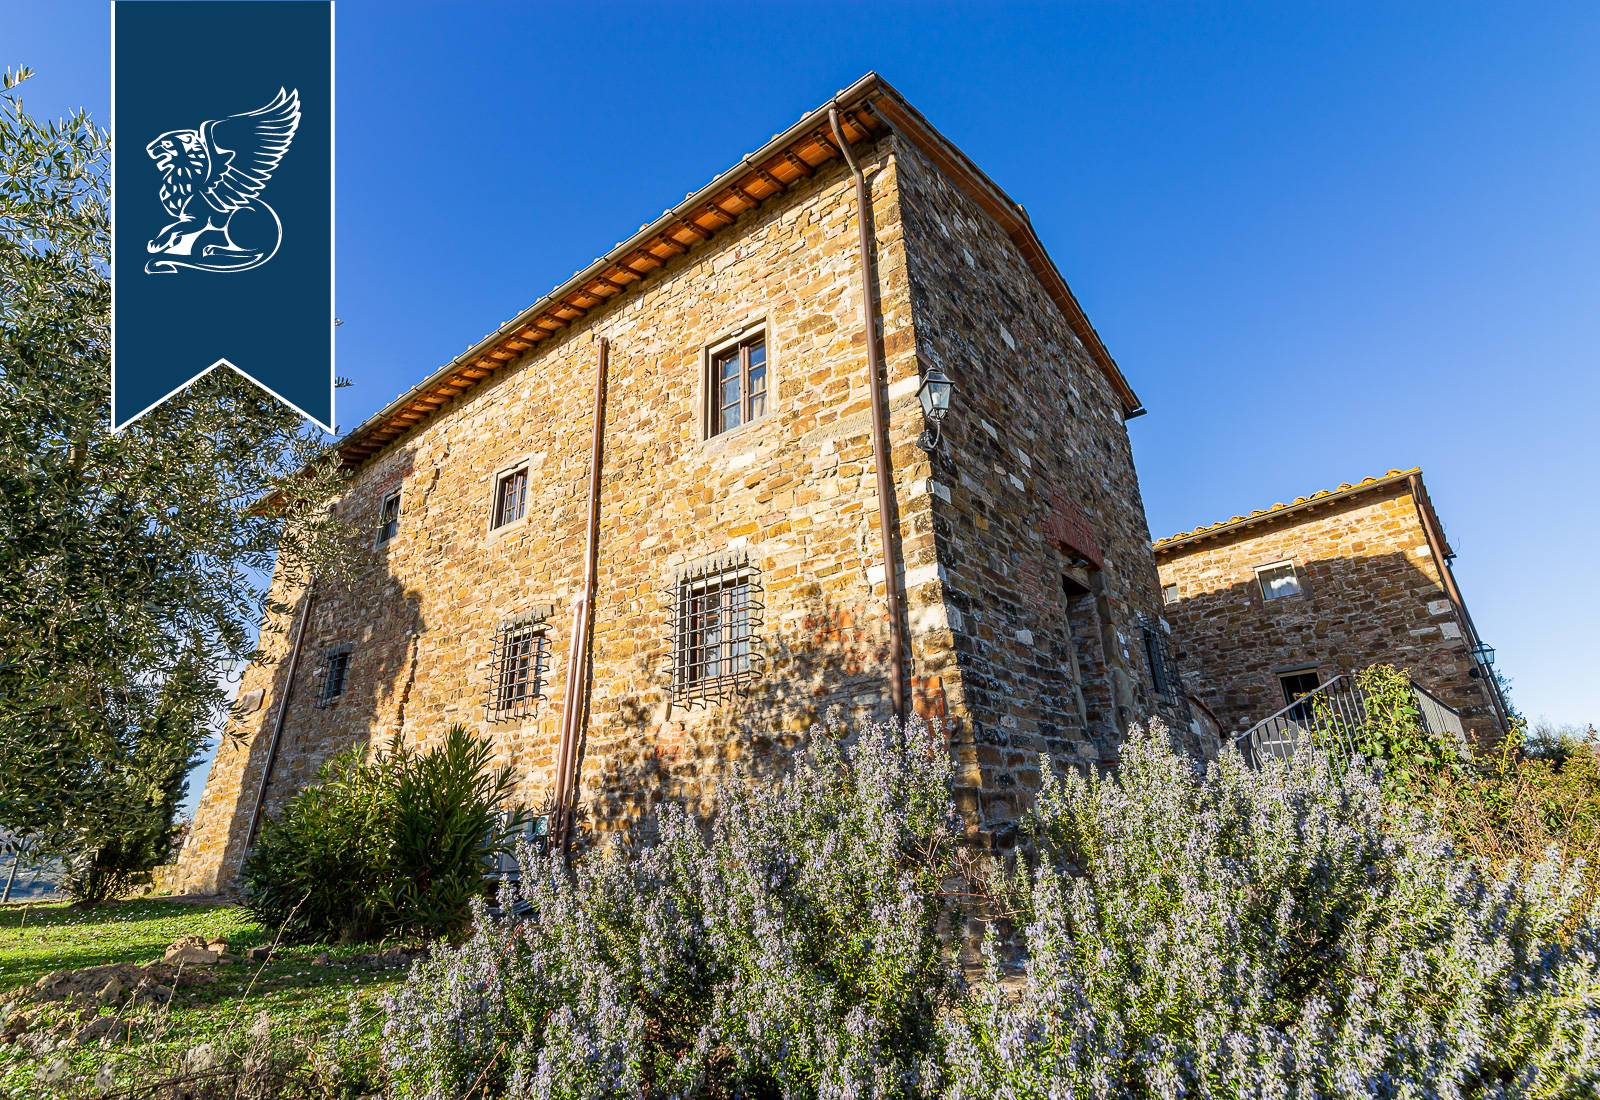 Villa in Vendita a Greve In Chianti: 0 locali, 400 mq - Foto 4